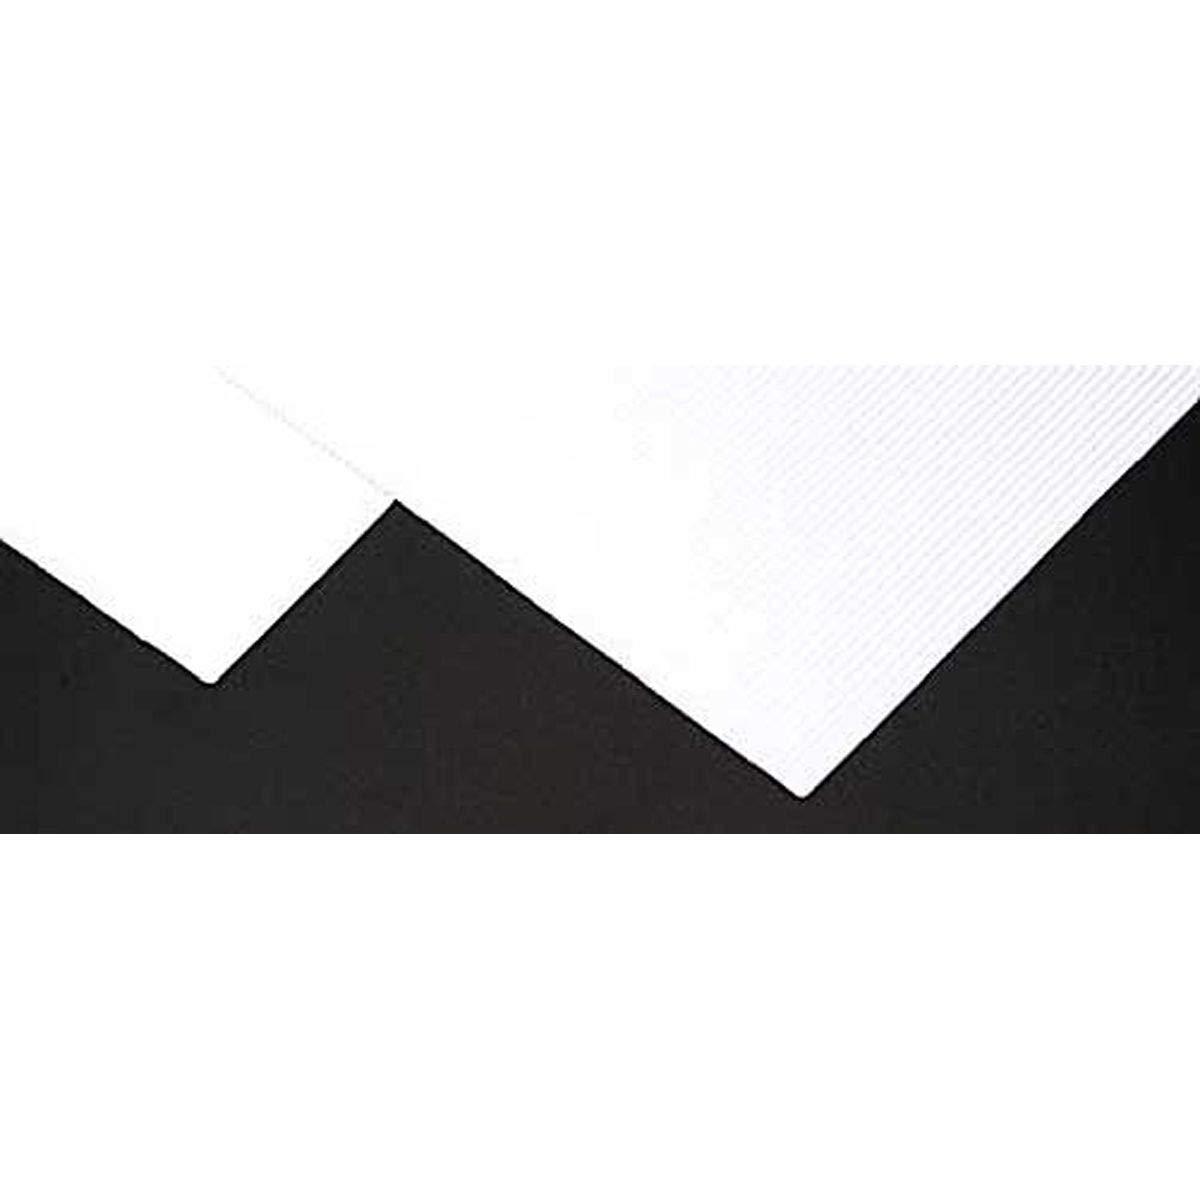 PS-11 HO Corrugated Sheets (2) Plastruct PLS91509